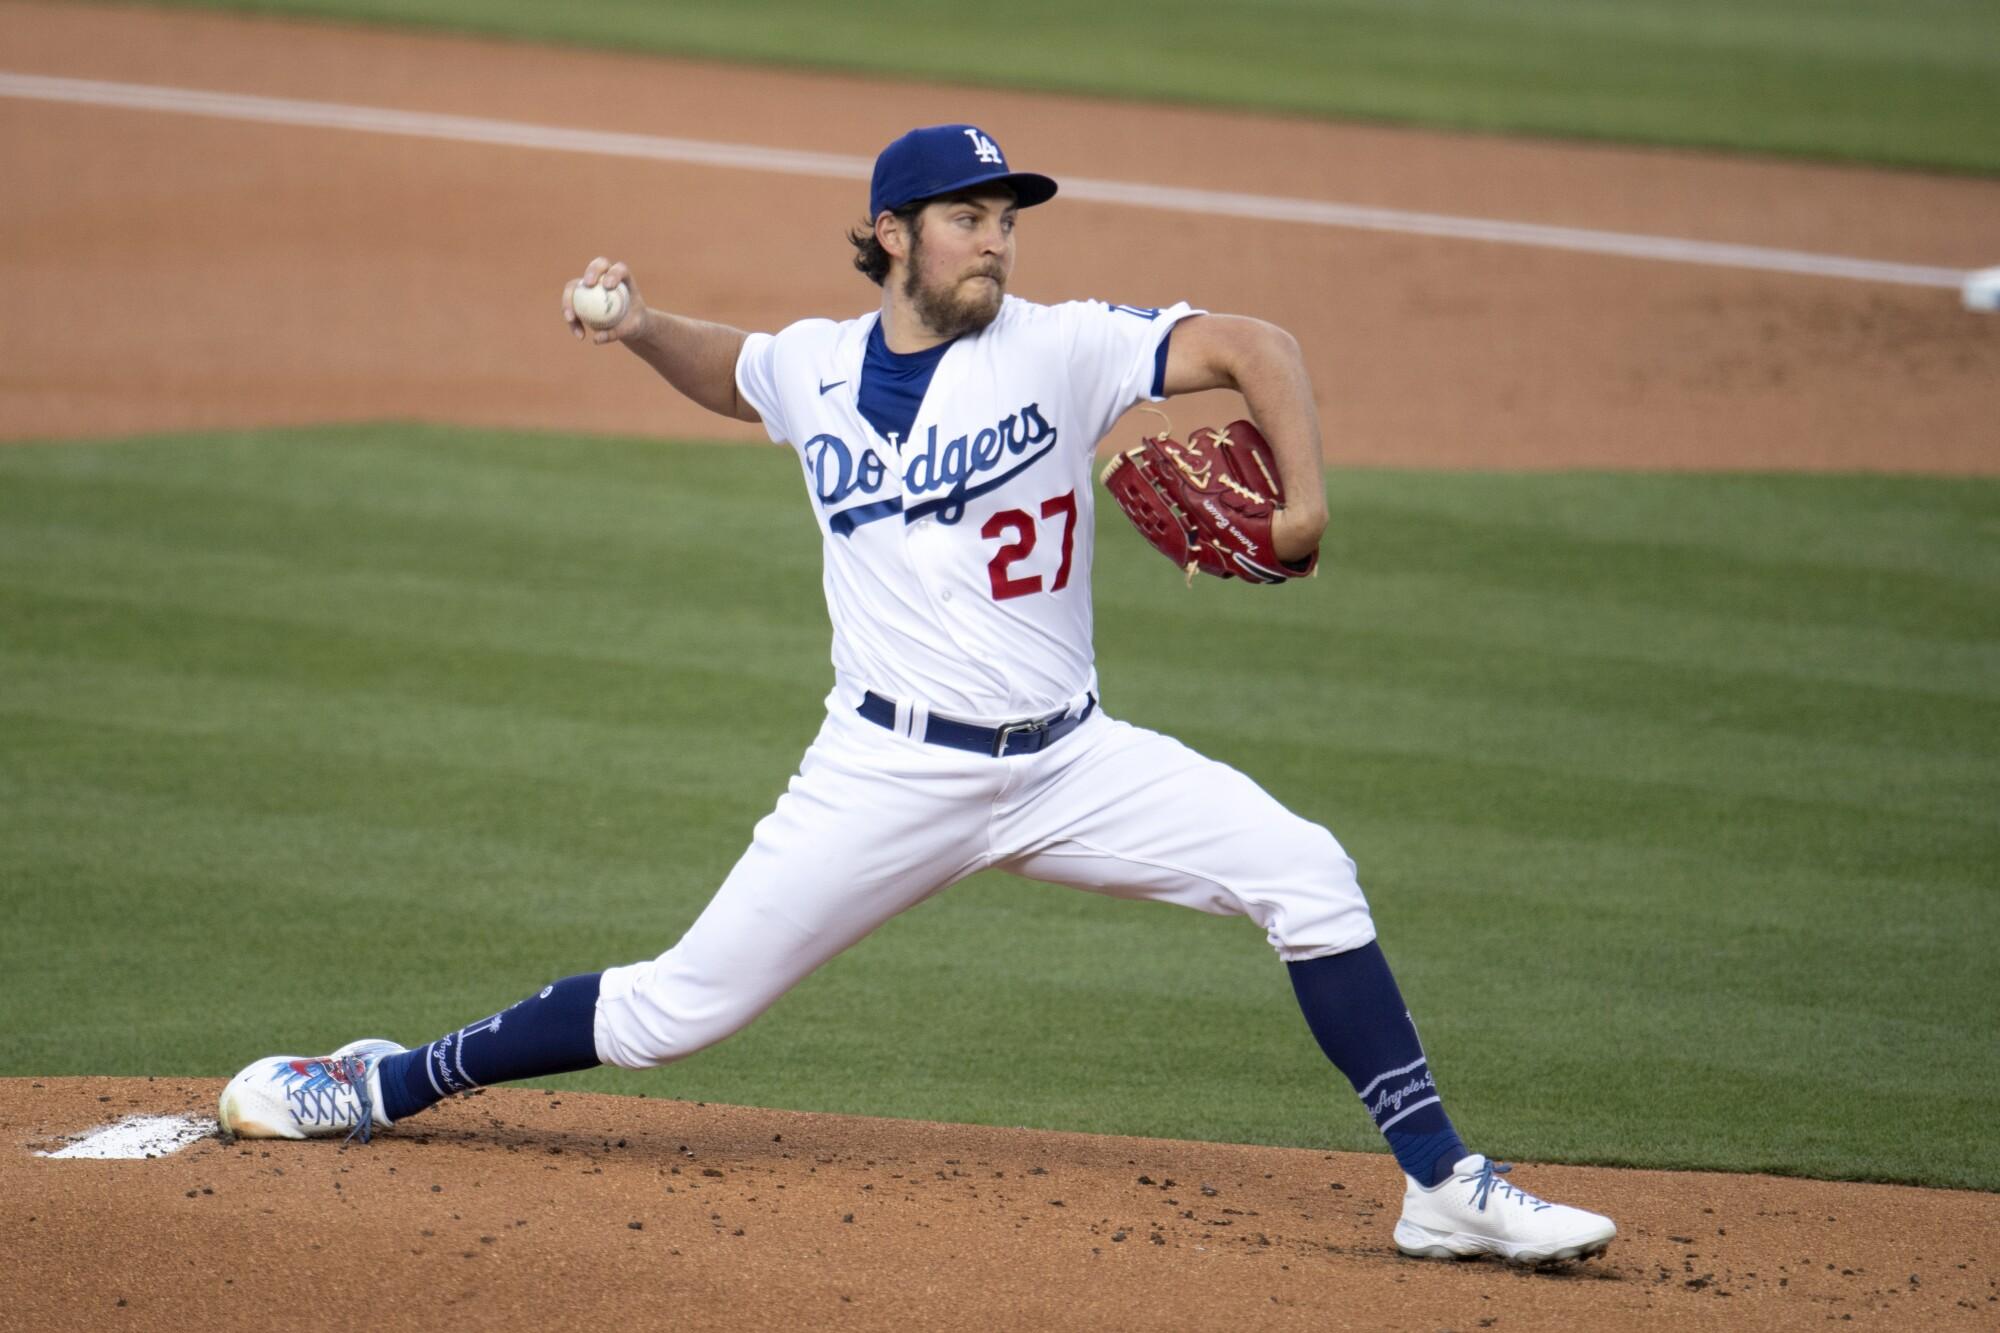 Dodgers pitcher Trevor Bauer